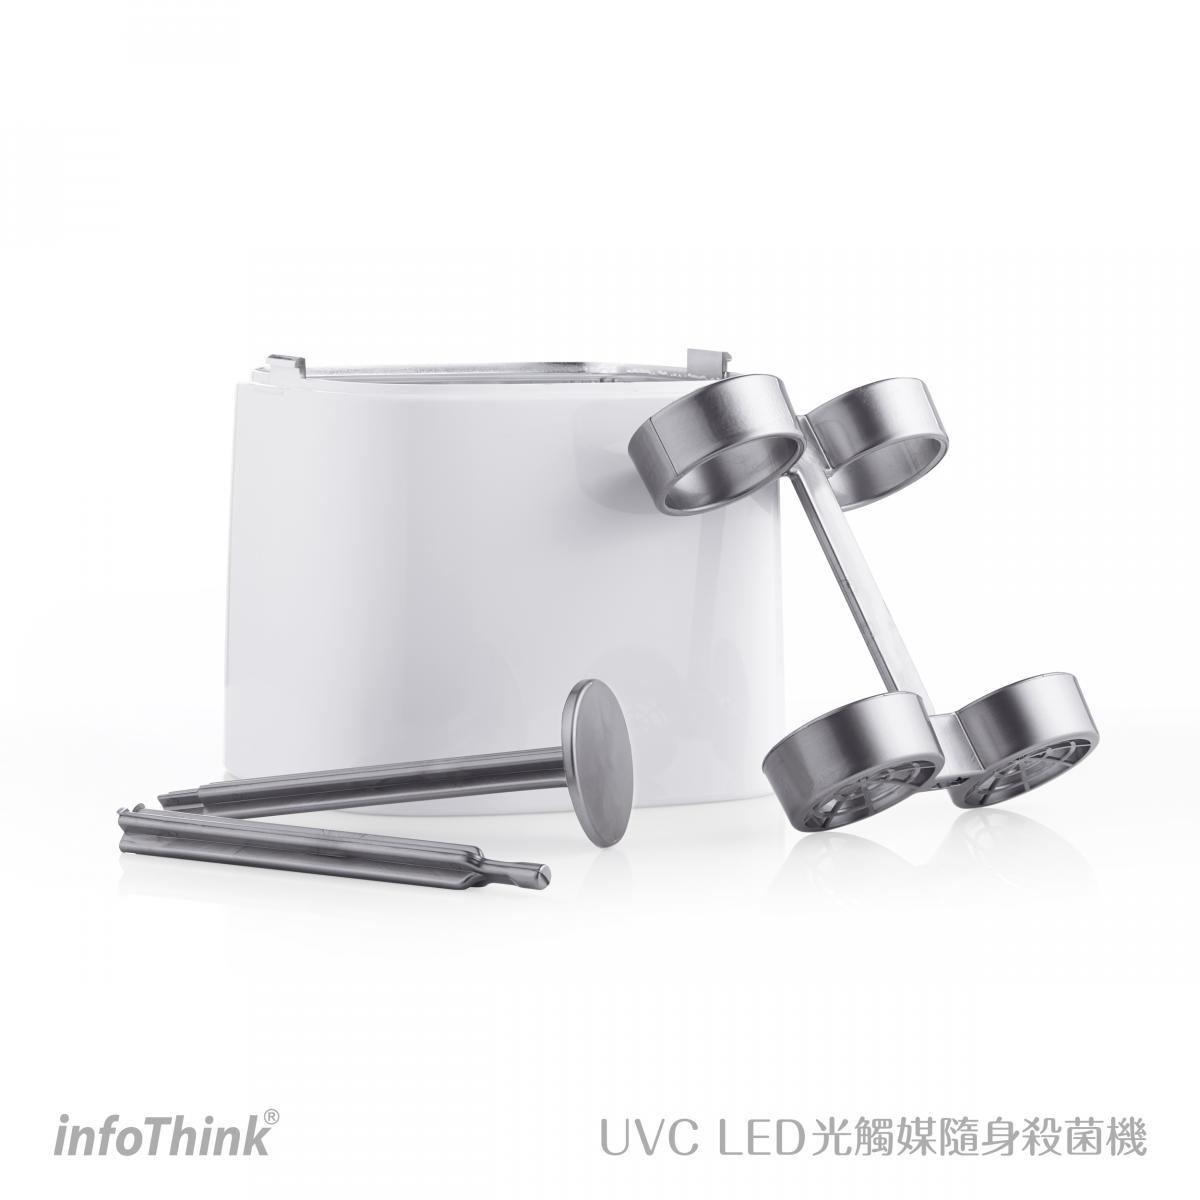 infoThink 專業級紫外線 UVC LED 光觸媒隨身殺菌機 (infoThink UVC LED Photocatalyst Sterilizer)